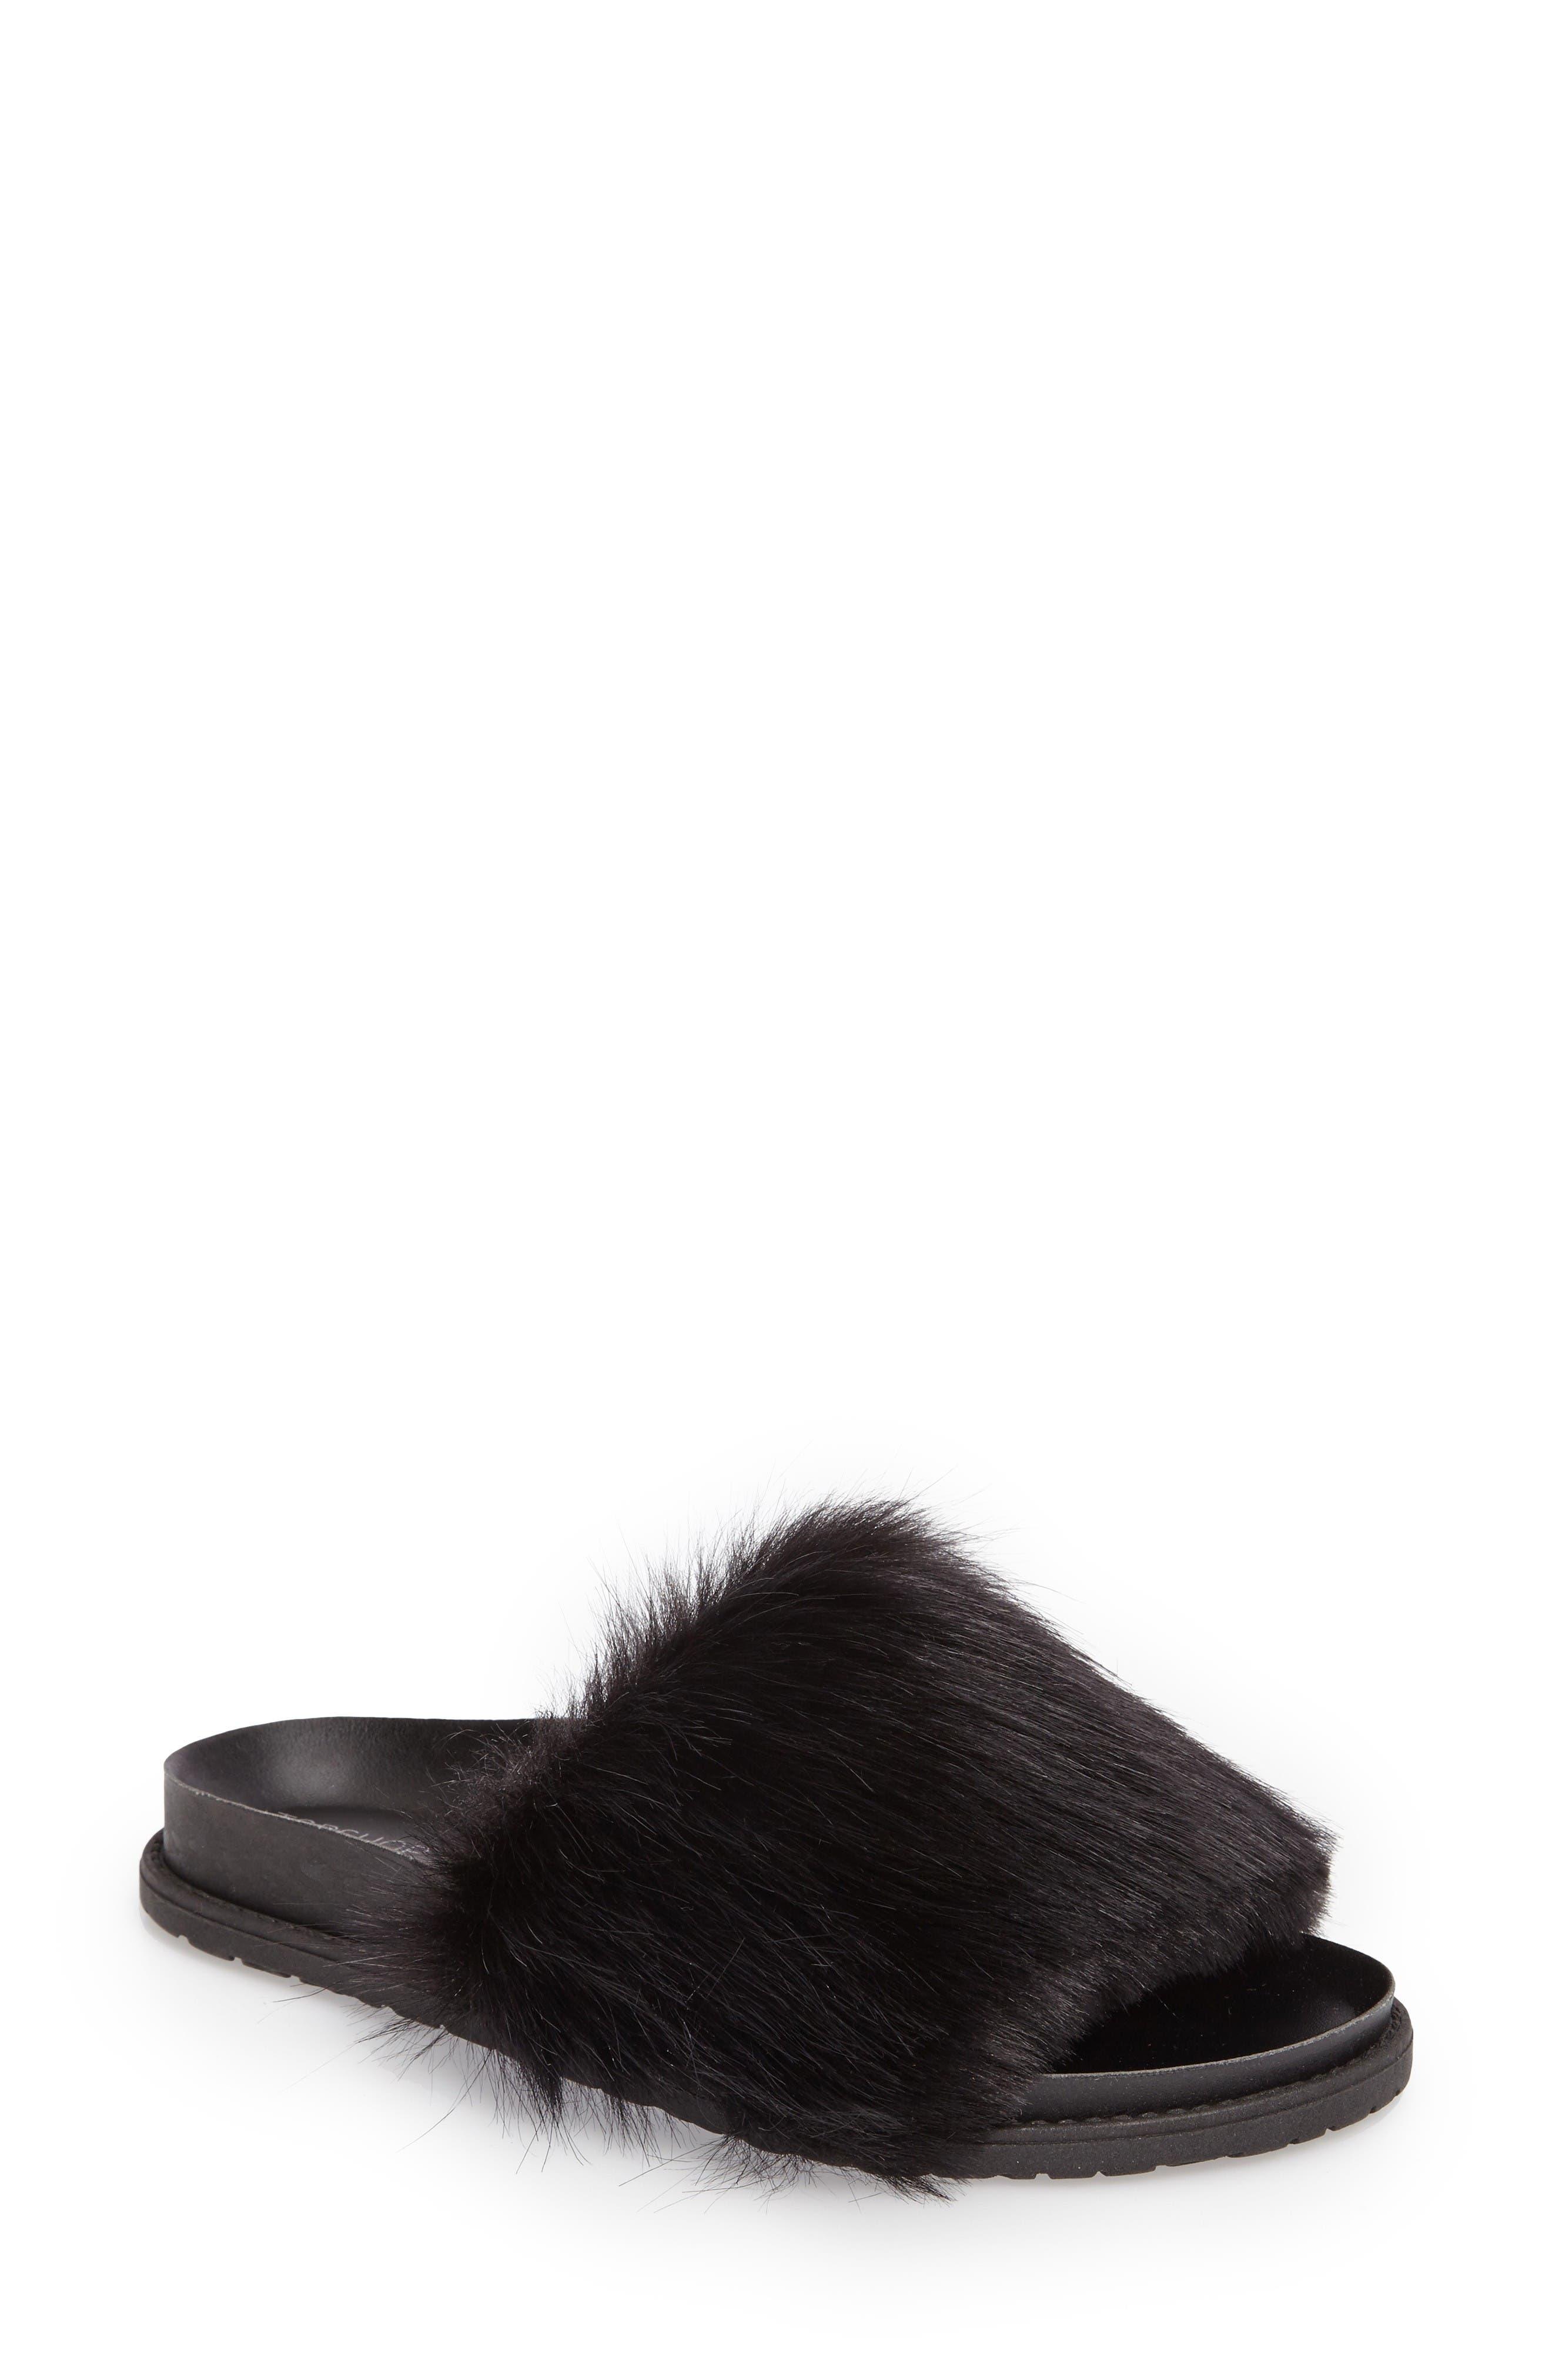 Main Image - Topshop Faux Fur Slide Sandal (Women)